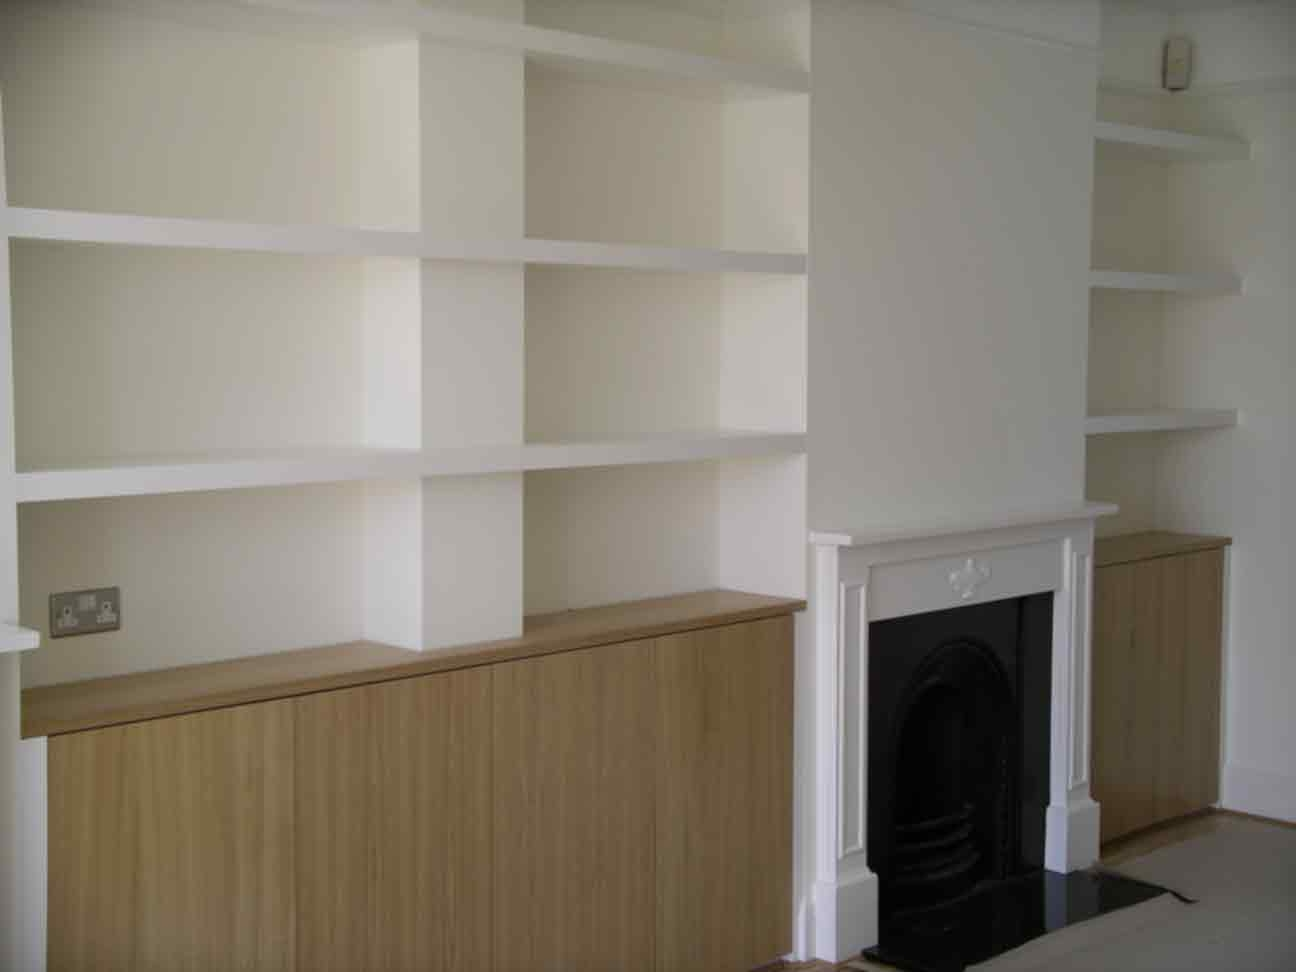 Built In Cupboards Bespoke Design Peter Henderson Furniture Pertaining To Handmade Cupboards (Image 4 of 12)